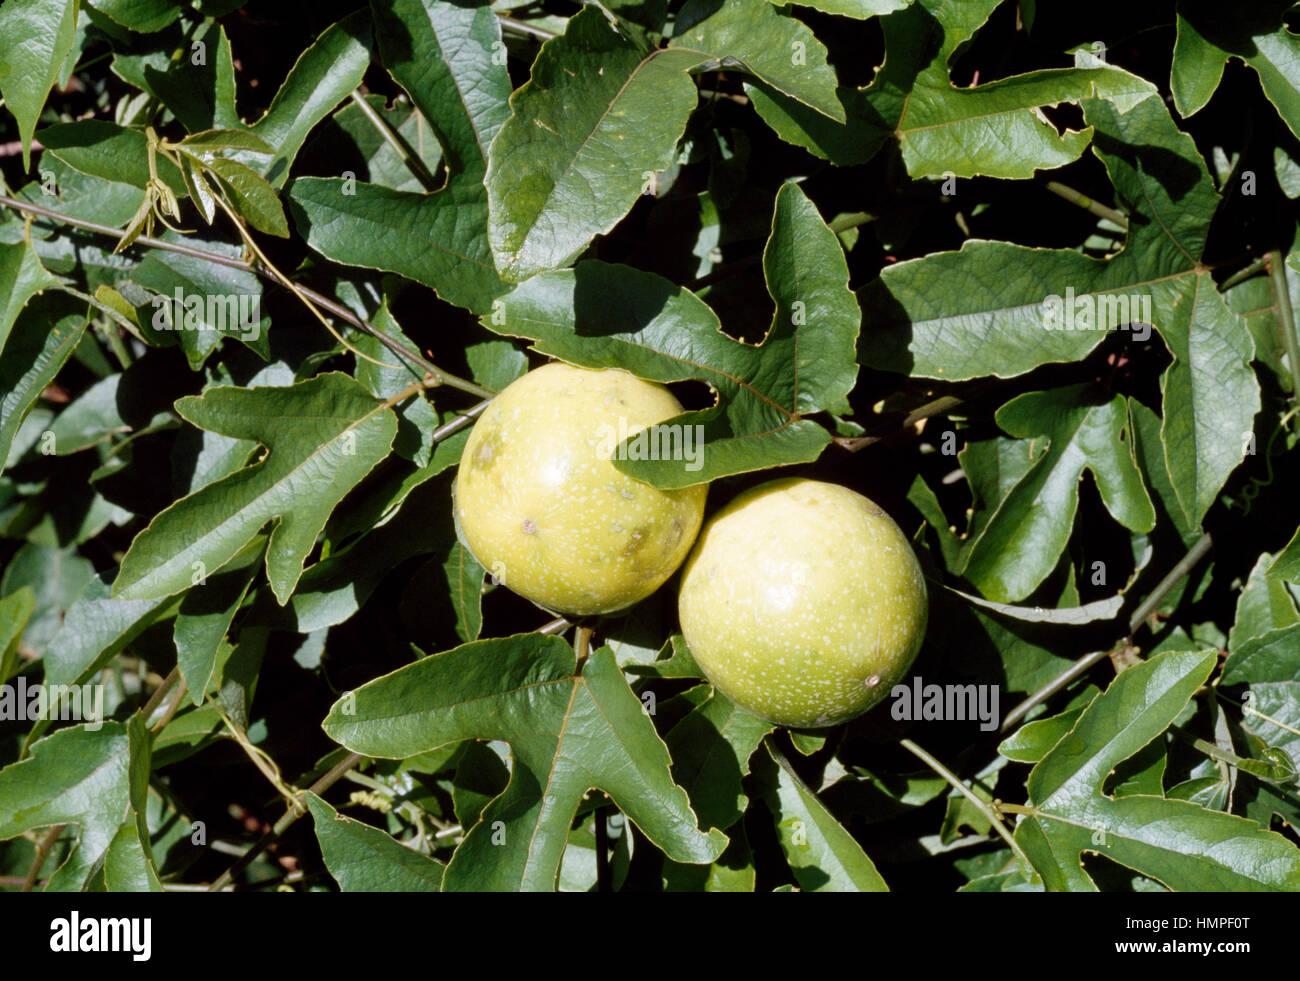 Violeta de agua de limón o fruta de la pasión (Passiflora edulis), Passifloraceae. Imagen De Stock